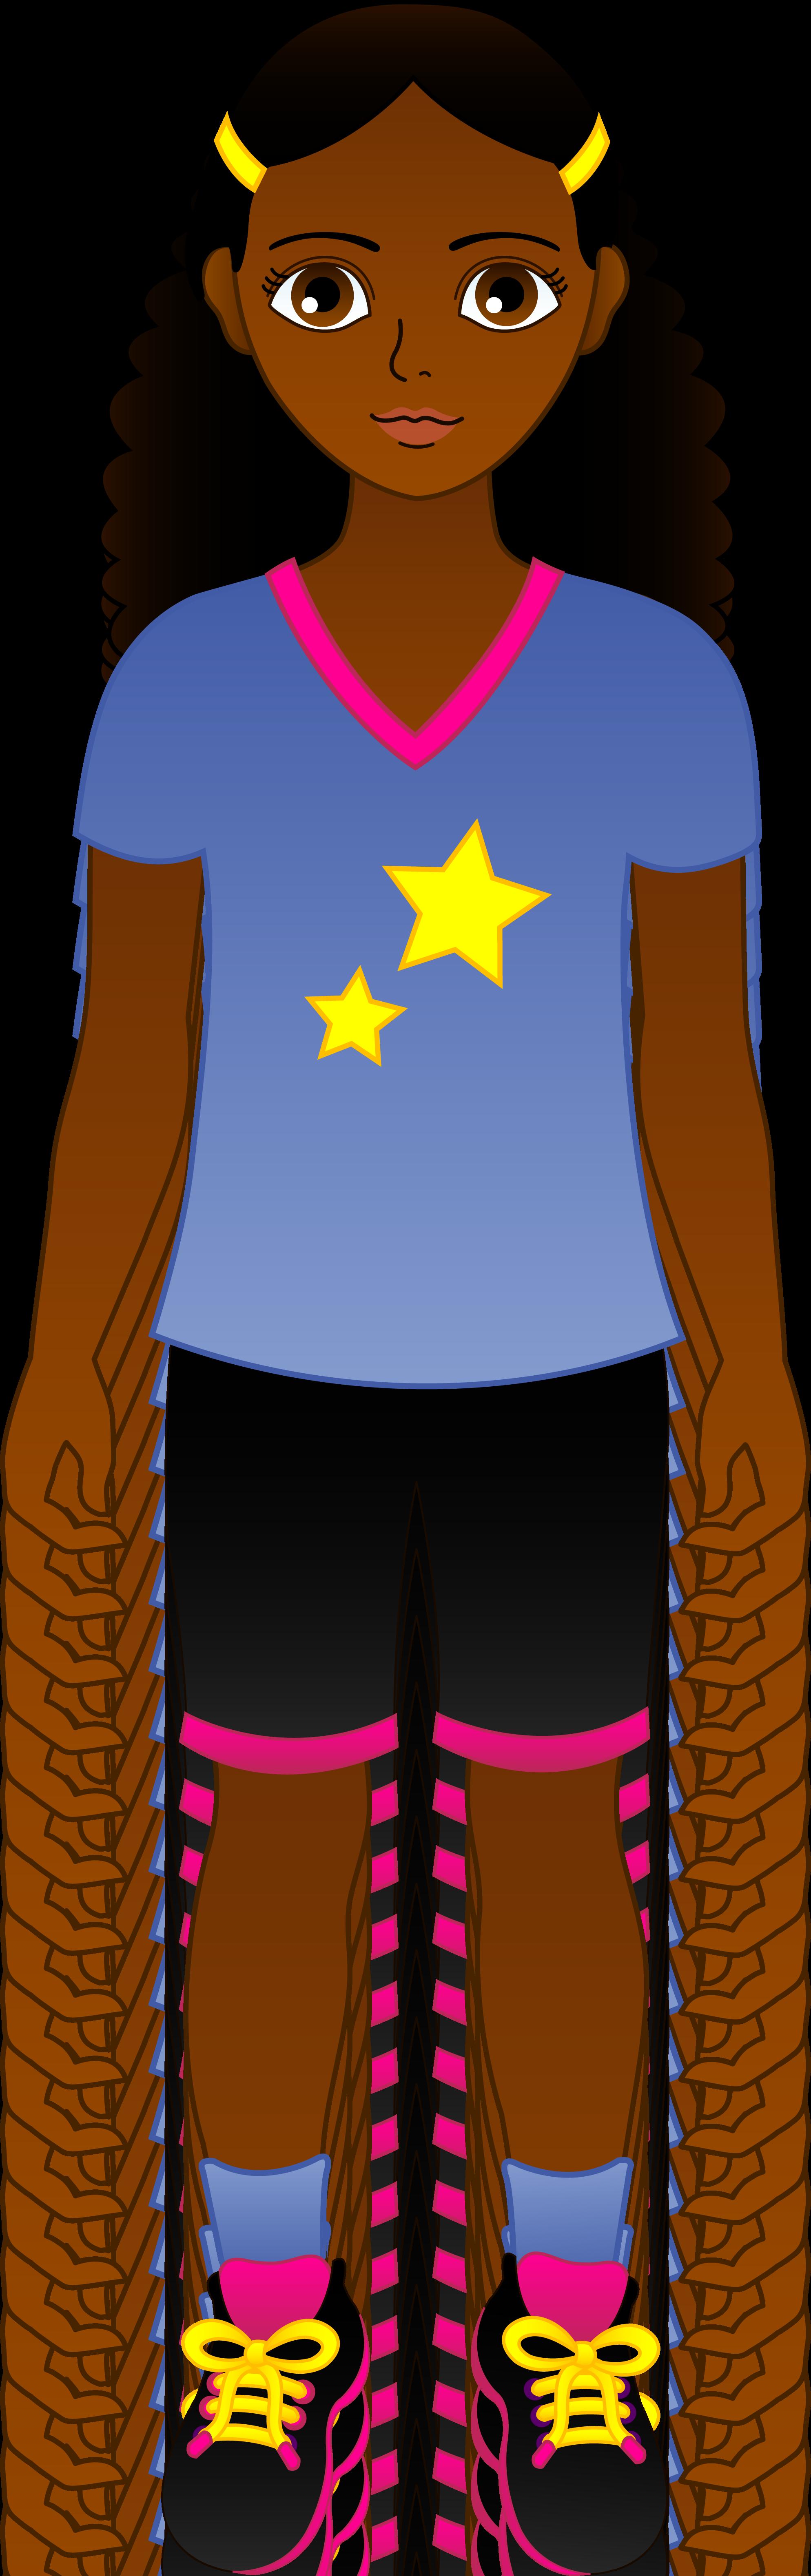 Free Black Girl Cliparts, Download Free Clip Art, Free Clip.